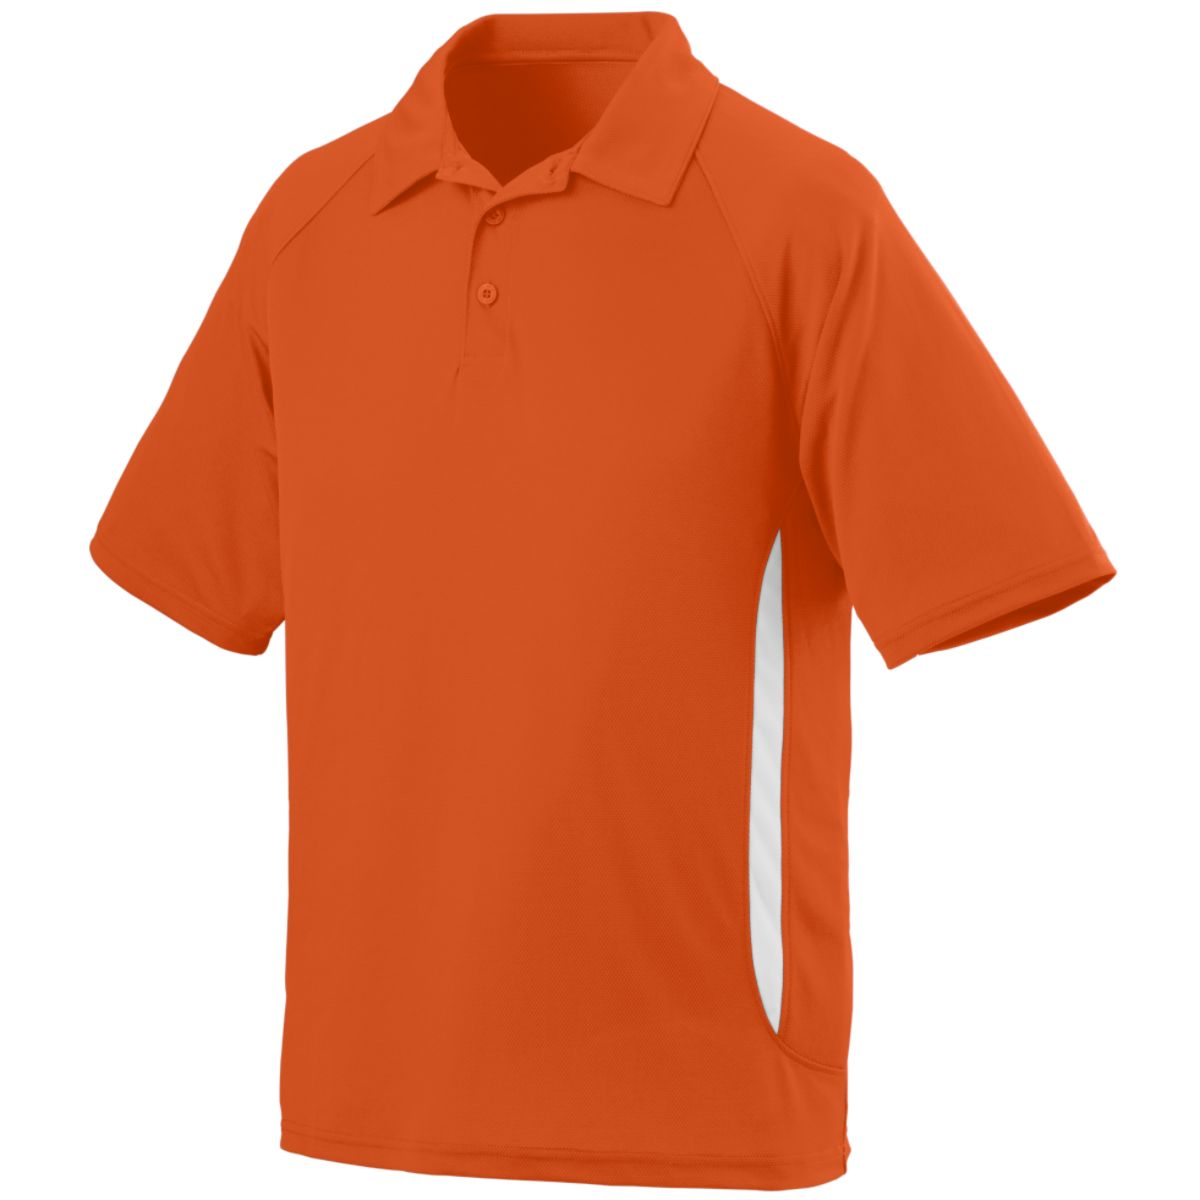 Augusta Mission Sport Shirt Ora/Whi 3Xl - image 1 of 1